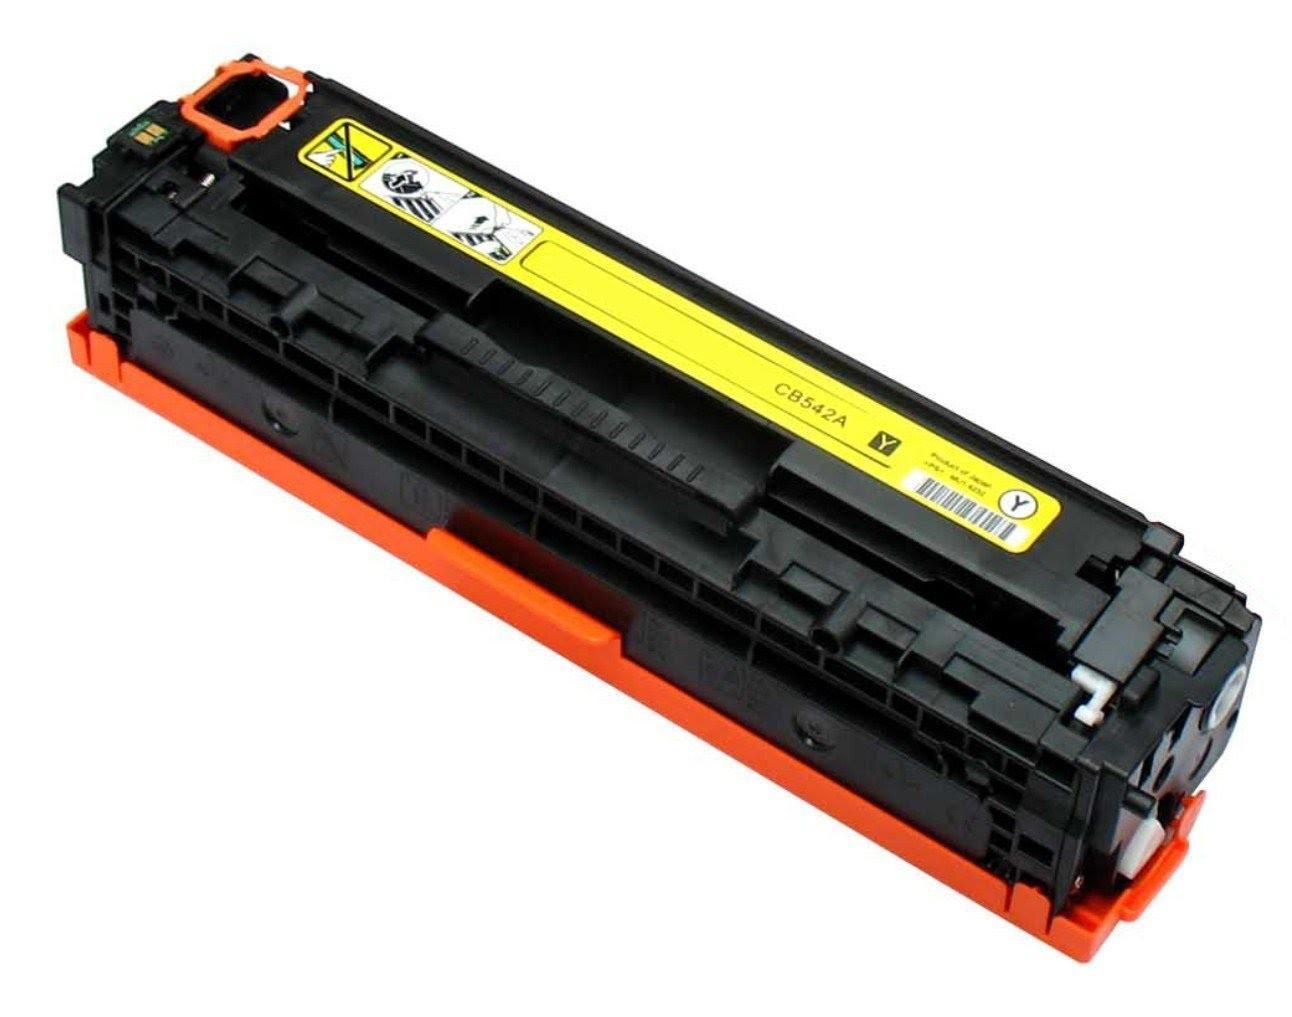 Cartus Toner 305a Compatibil Hp Culoare: Yellow